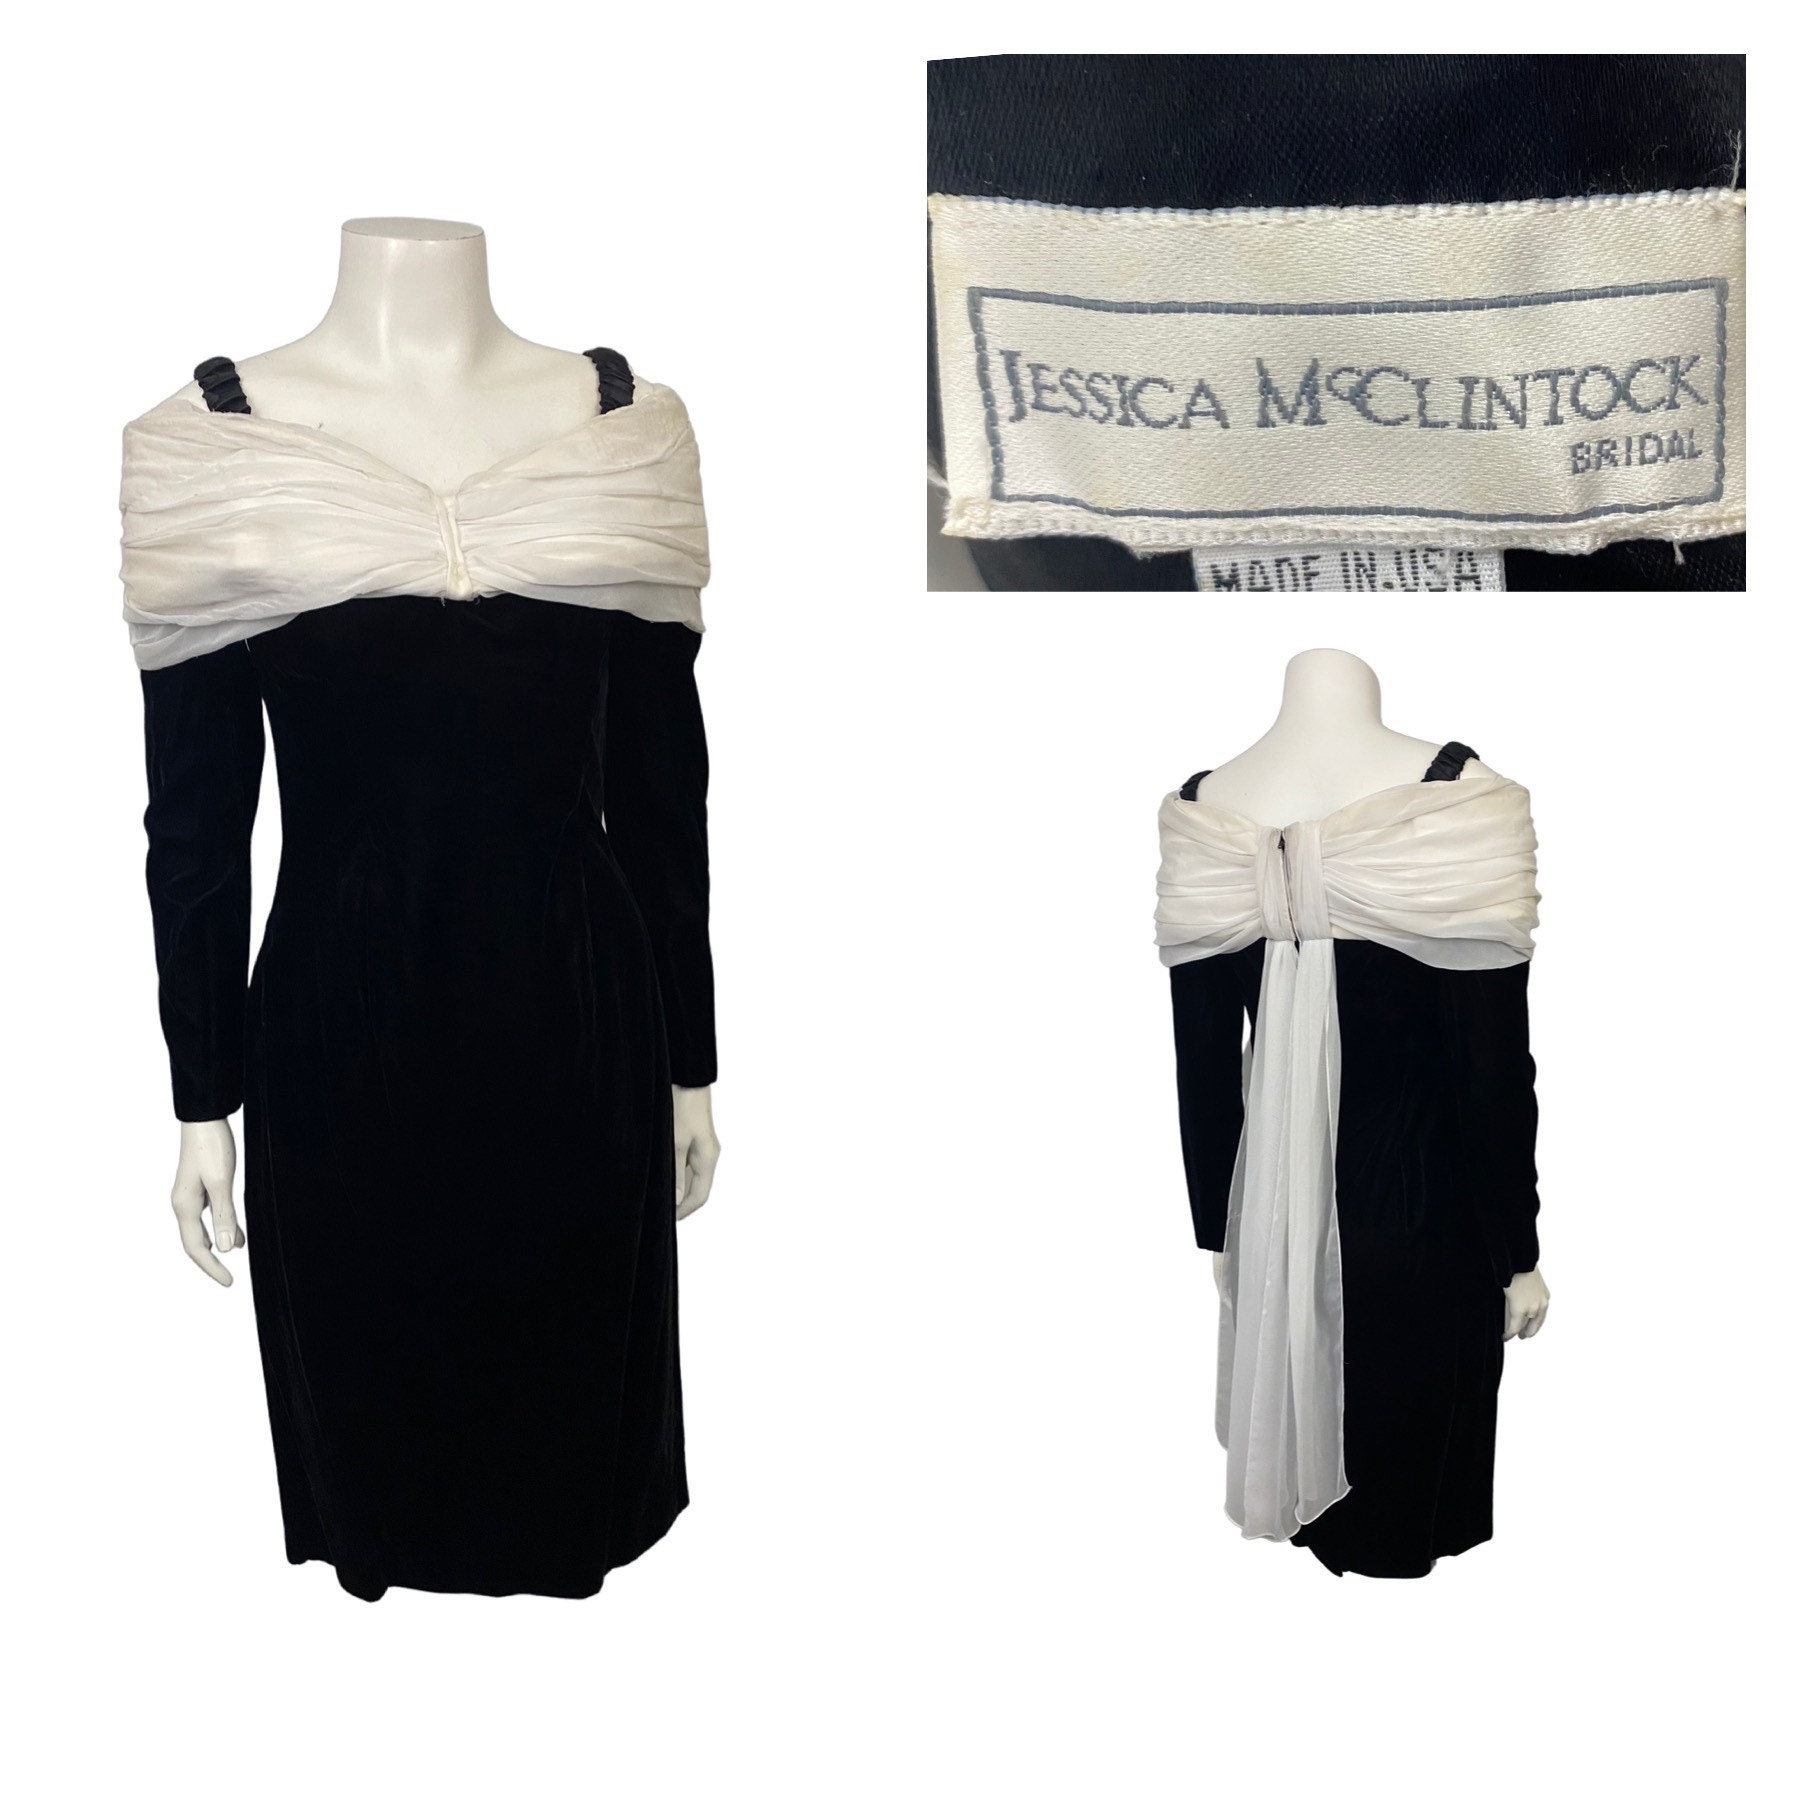 80s Dresses | Casual to Party Dresses Vintage Jessica Mcclintock DressVelvet Off The Shoulders Party Womens Xs $62.30 AT vintagedancer.com